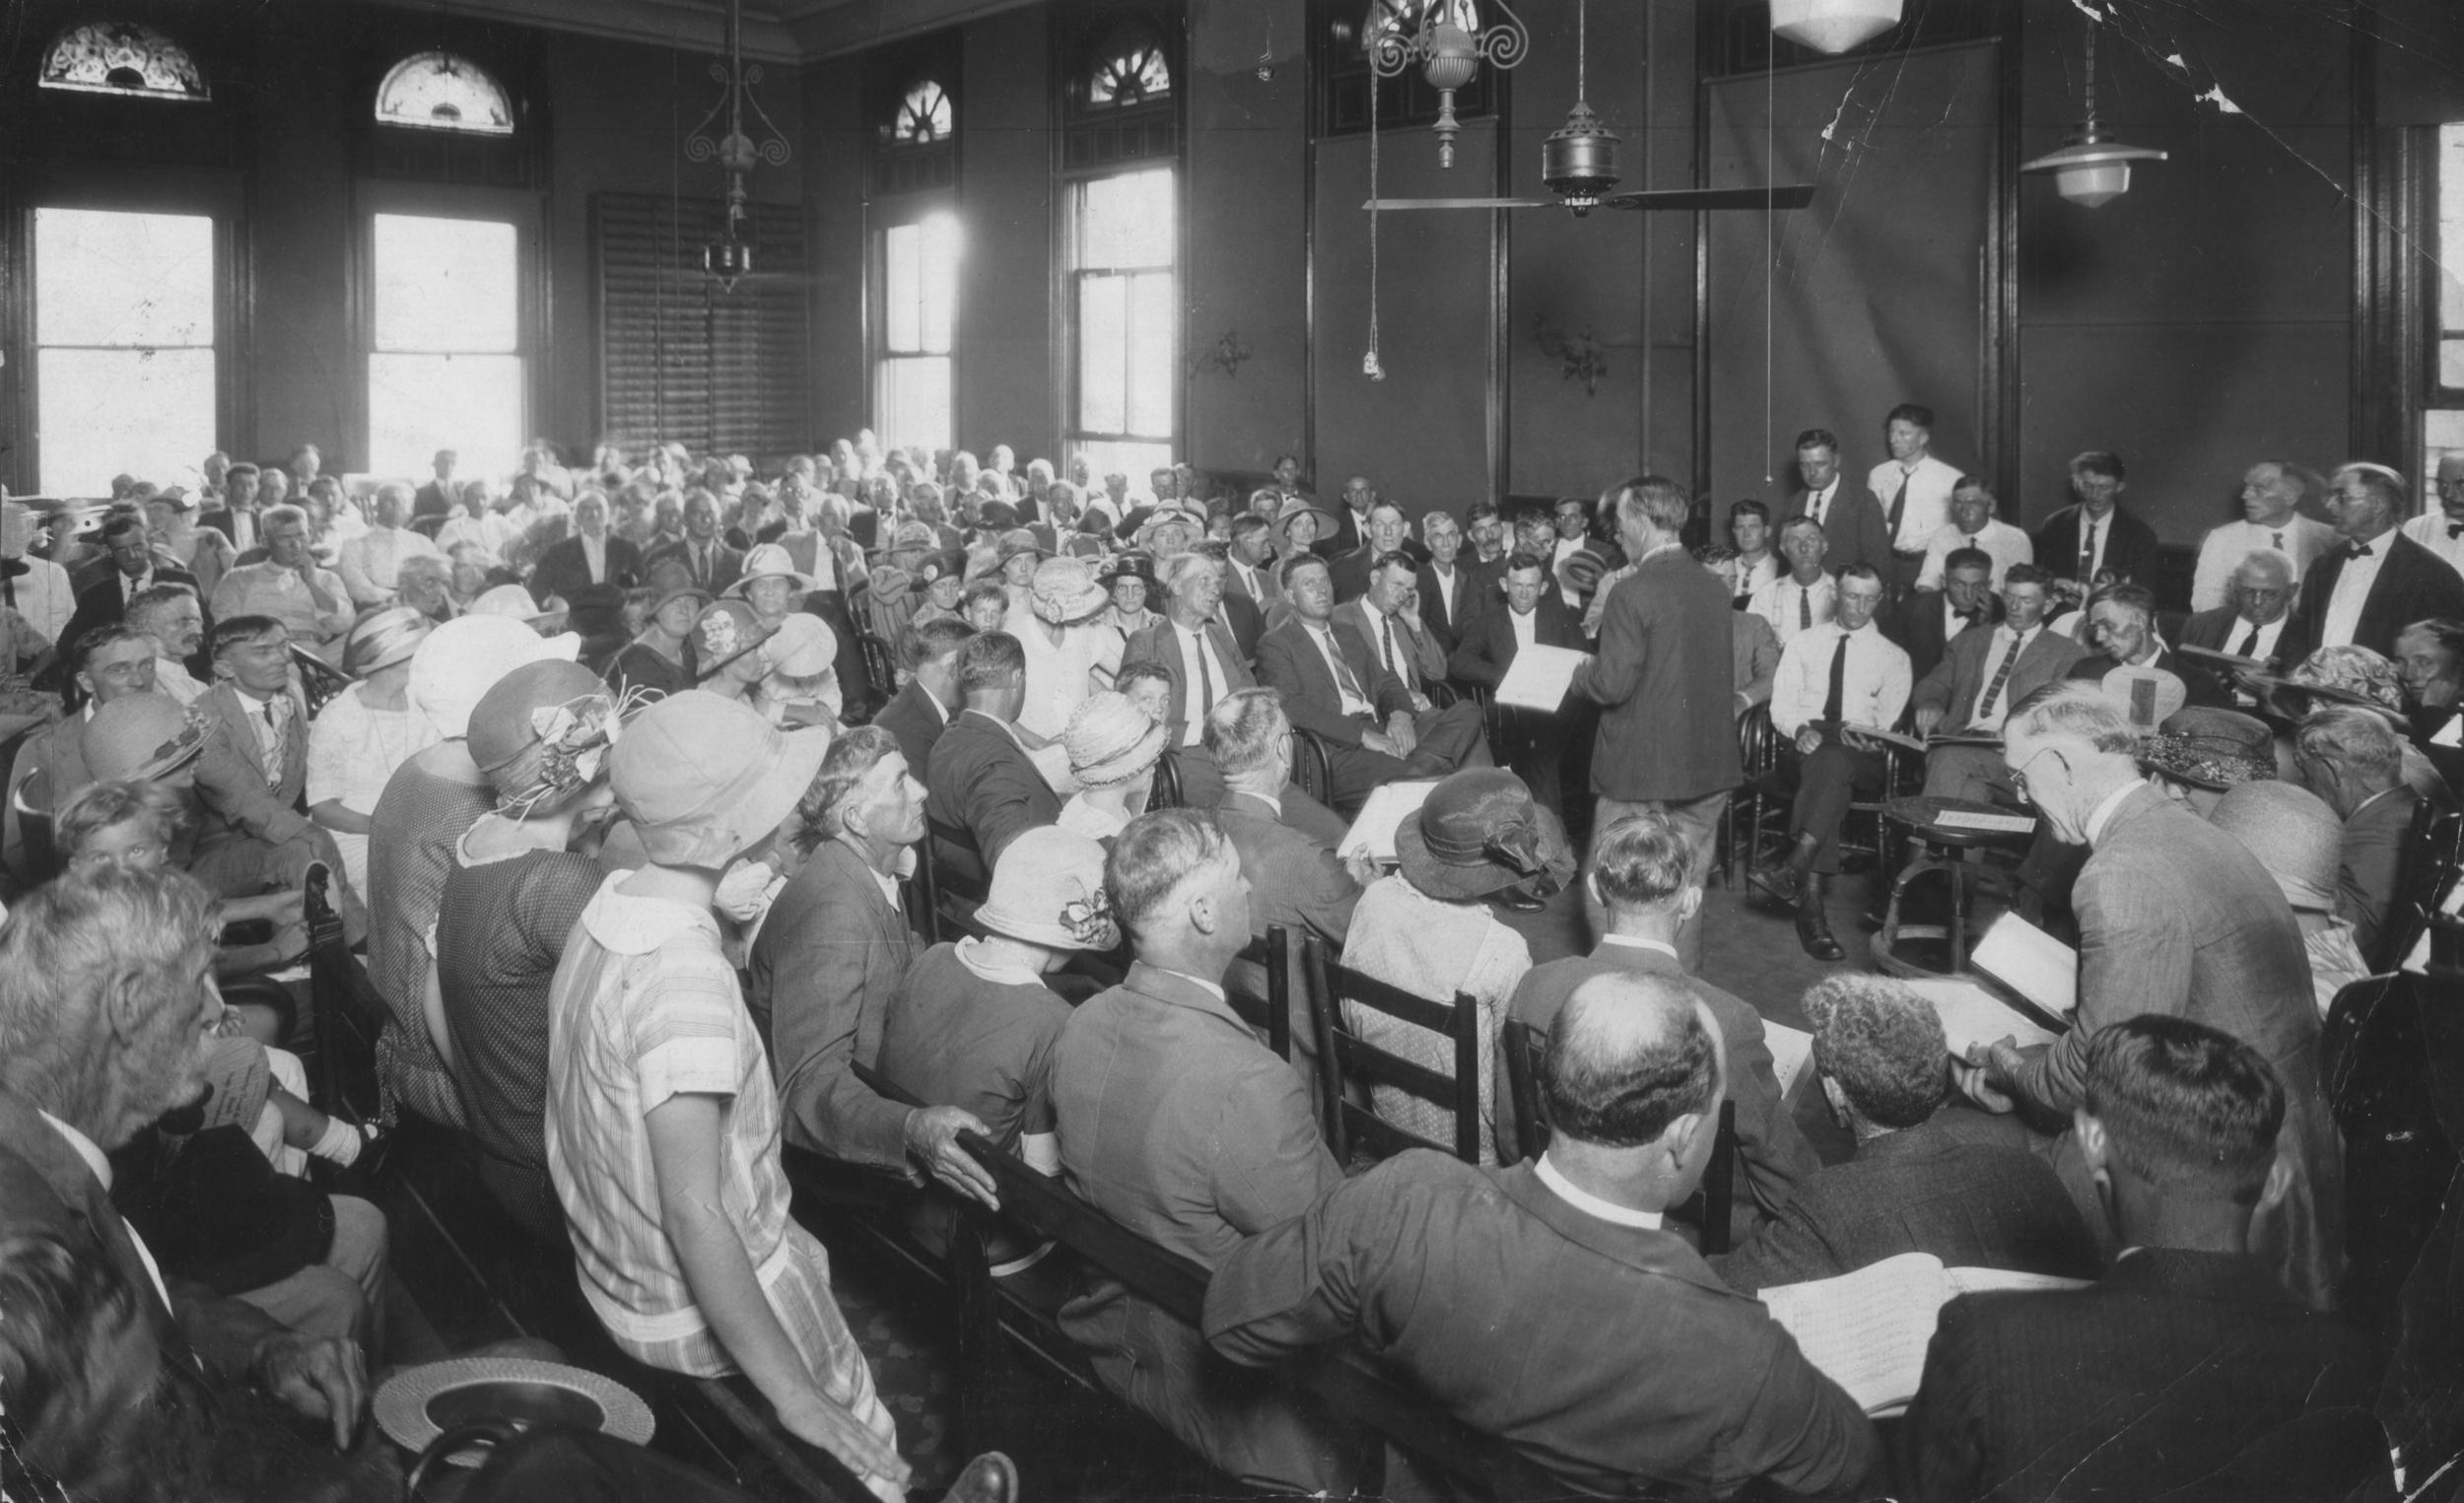 Sacred harp Convention Birmingham Courthouseresize.jpg